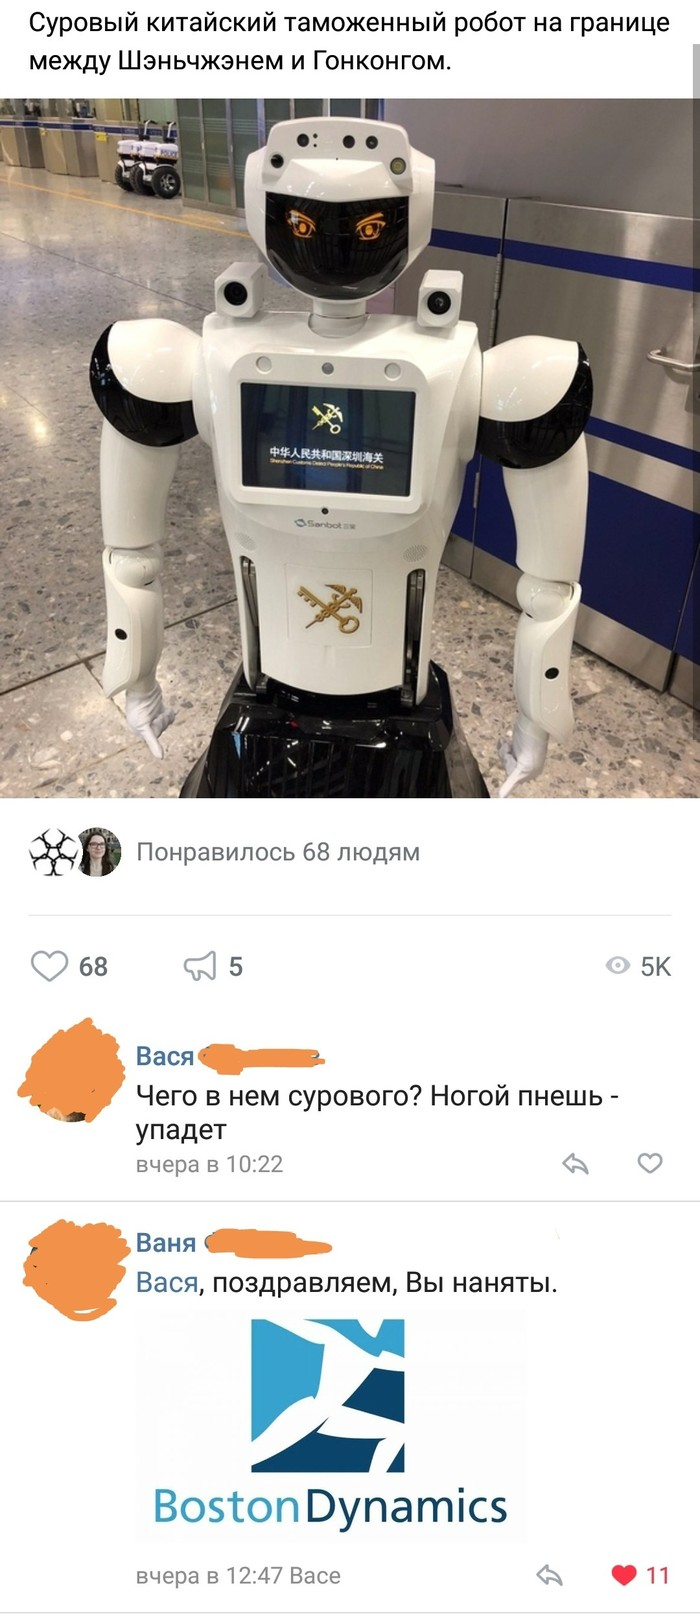 Призвание Boston Dynamics, Робот, ВКонтакте, Комментарии, Длиннопост